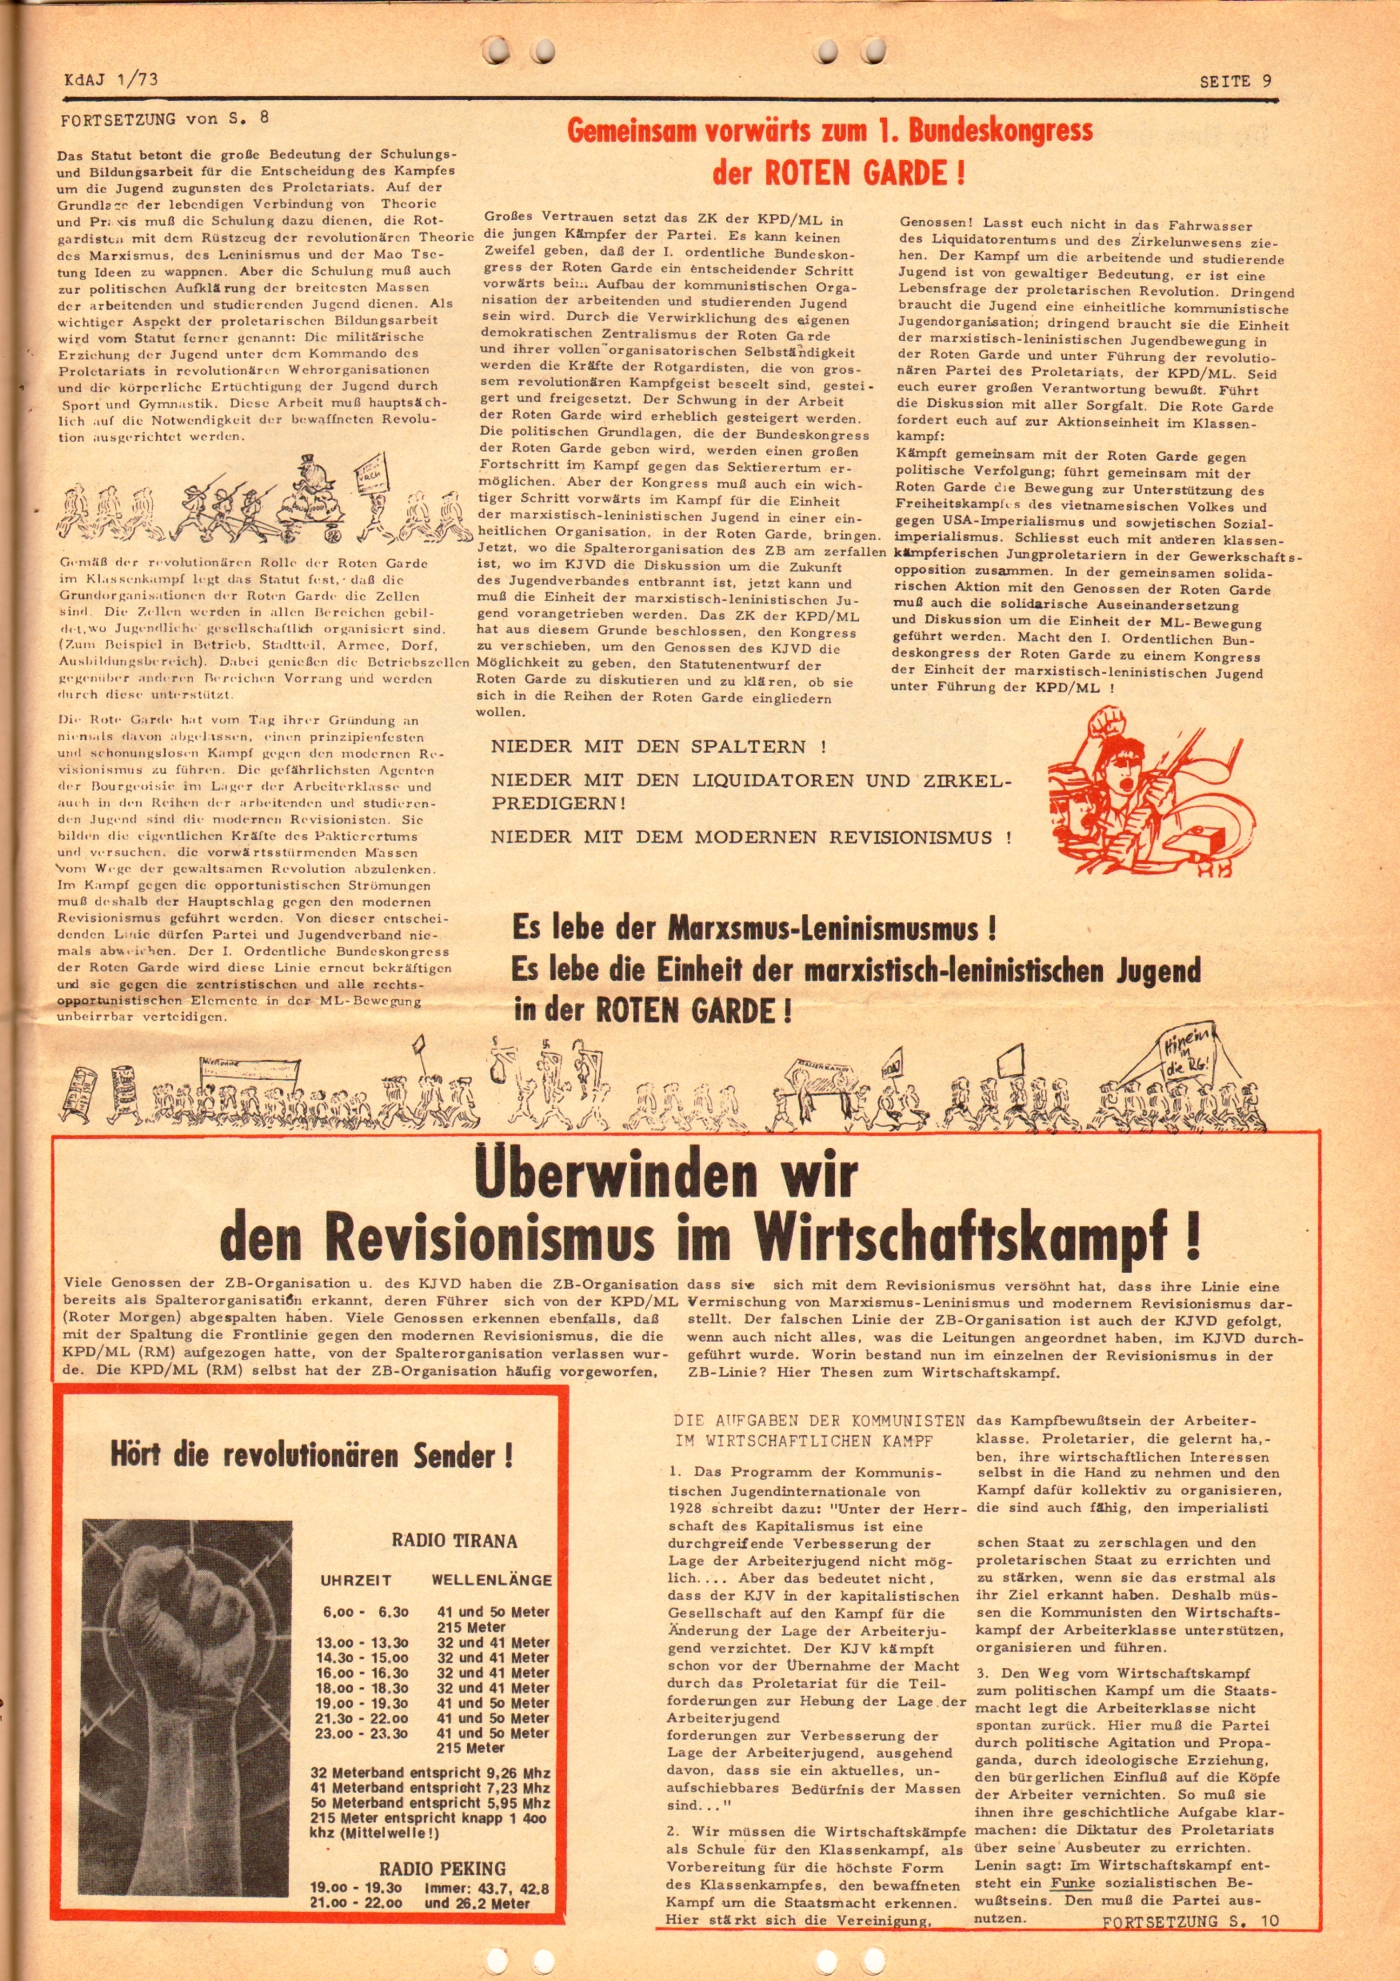 KDAJ, 4. Jg., März 1973, Nr. 1, Seite 9